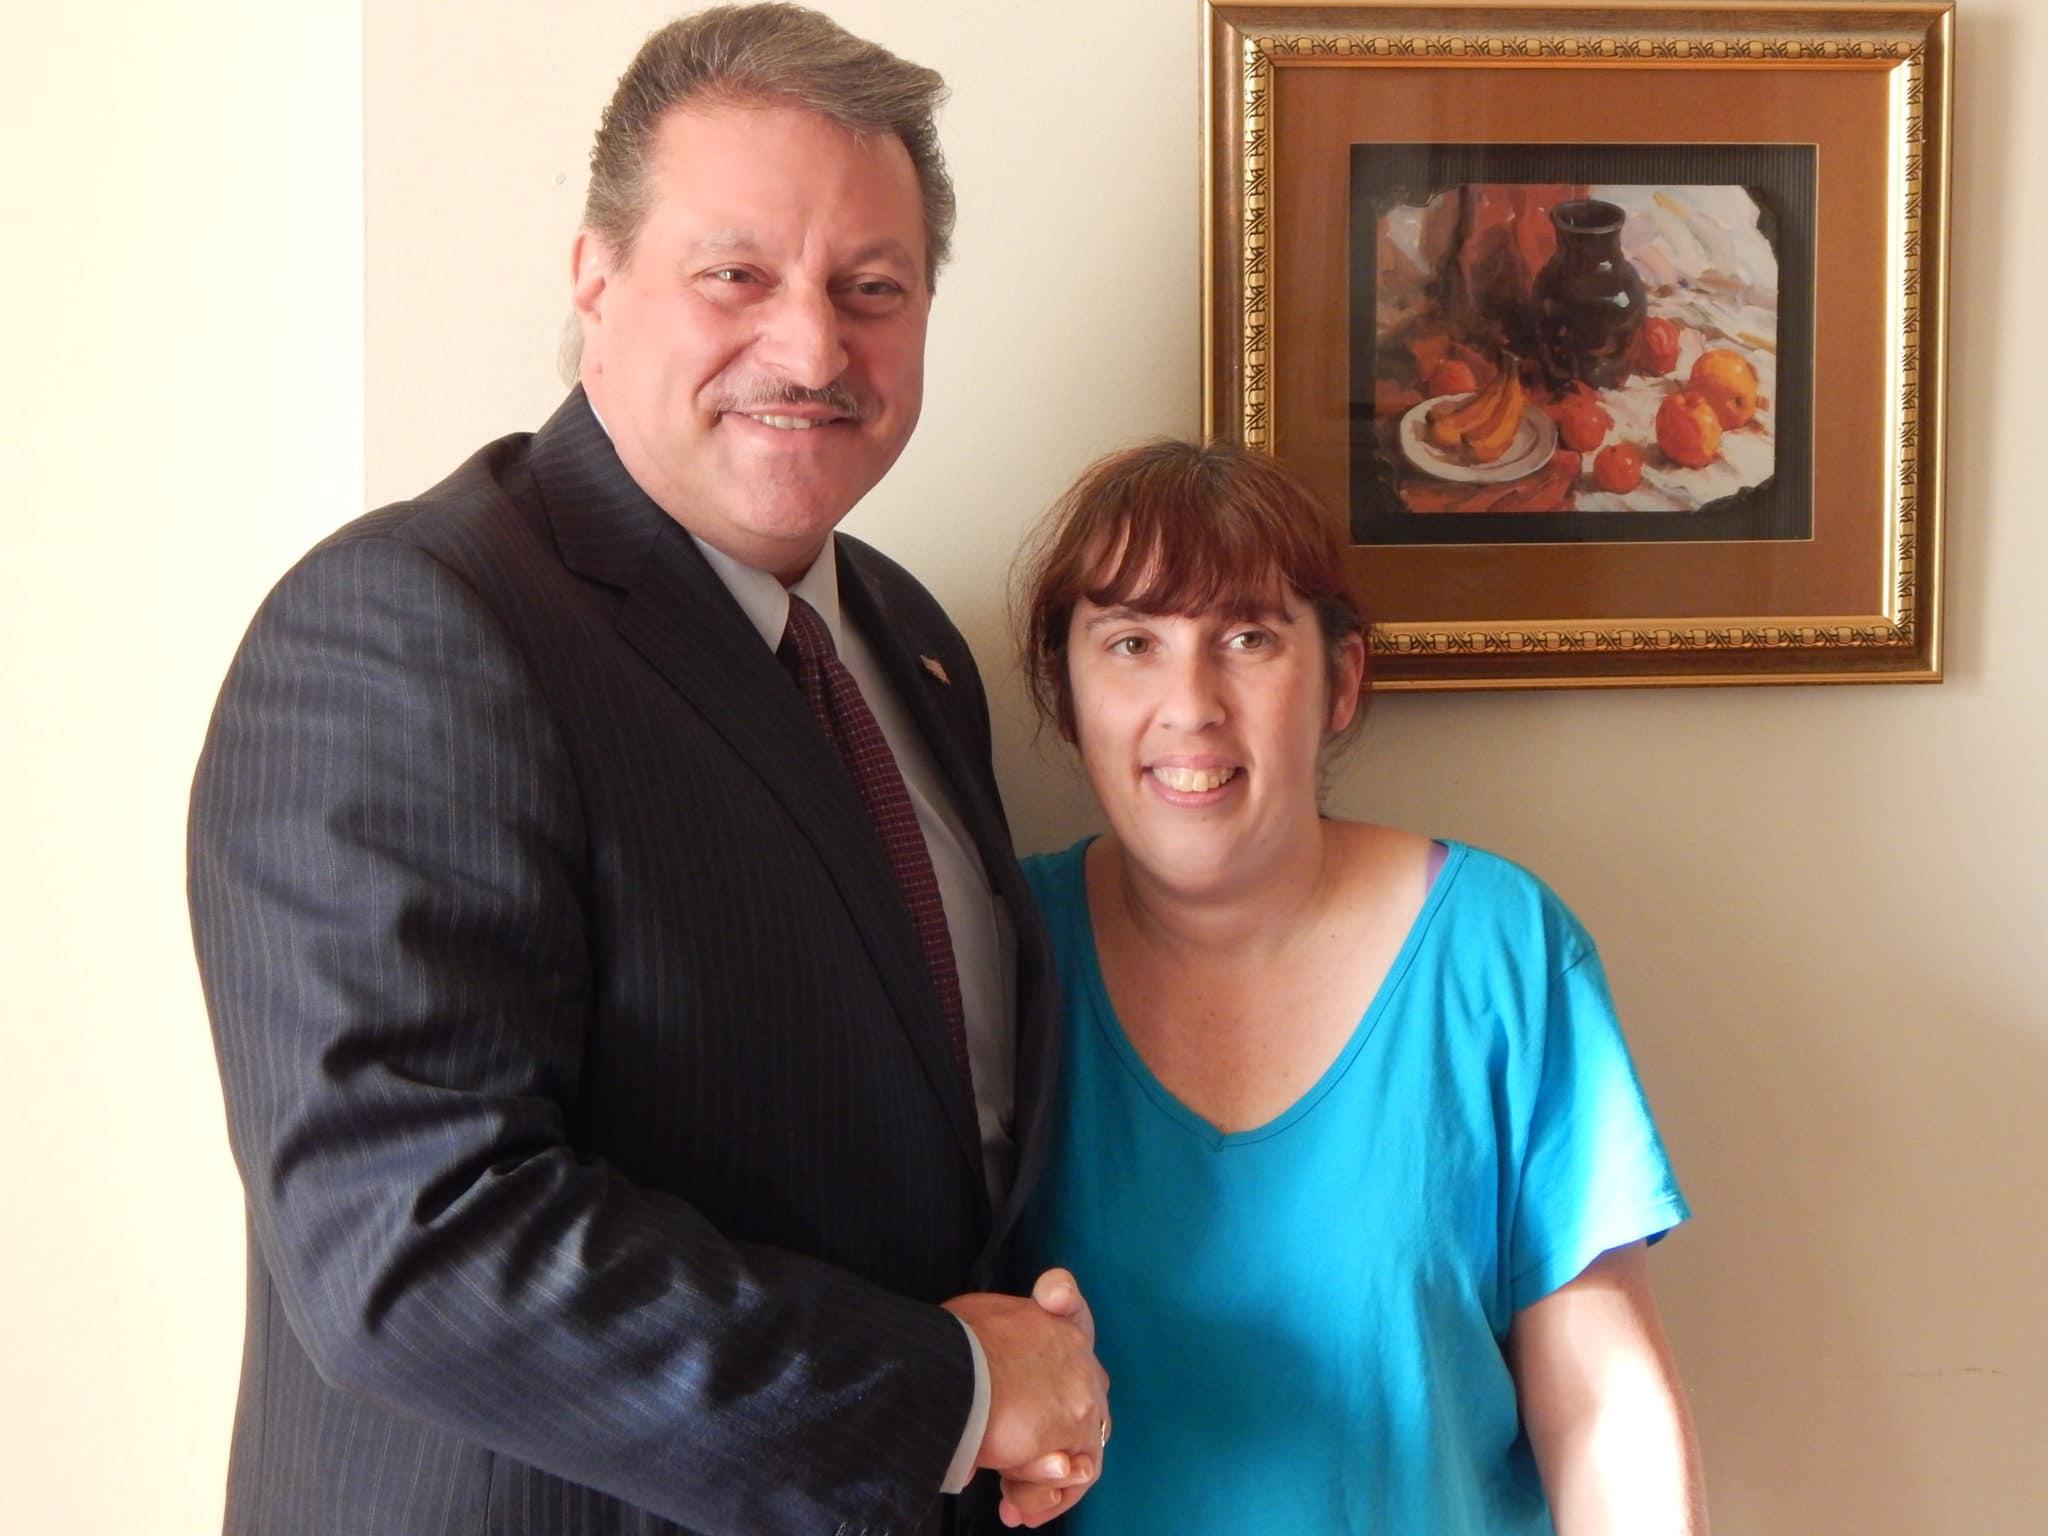 New York State Senator Joseph Addabbo Jr. spent the afternoon with Dawn.